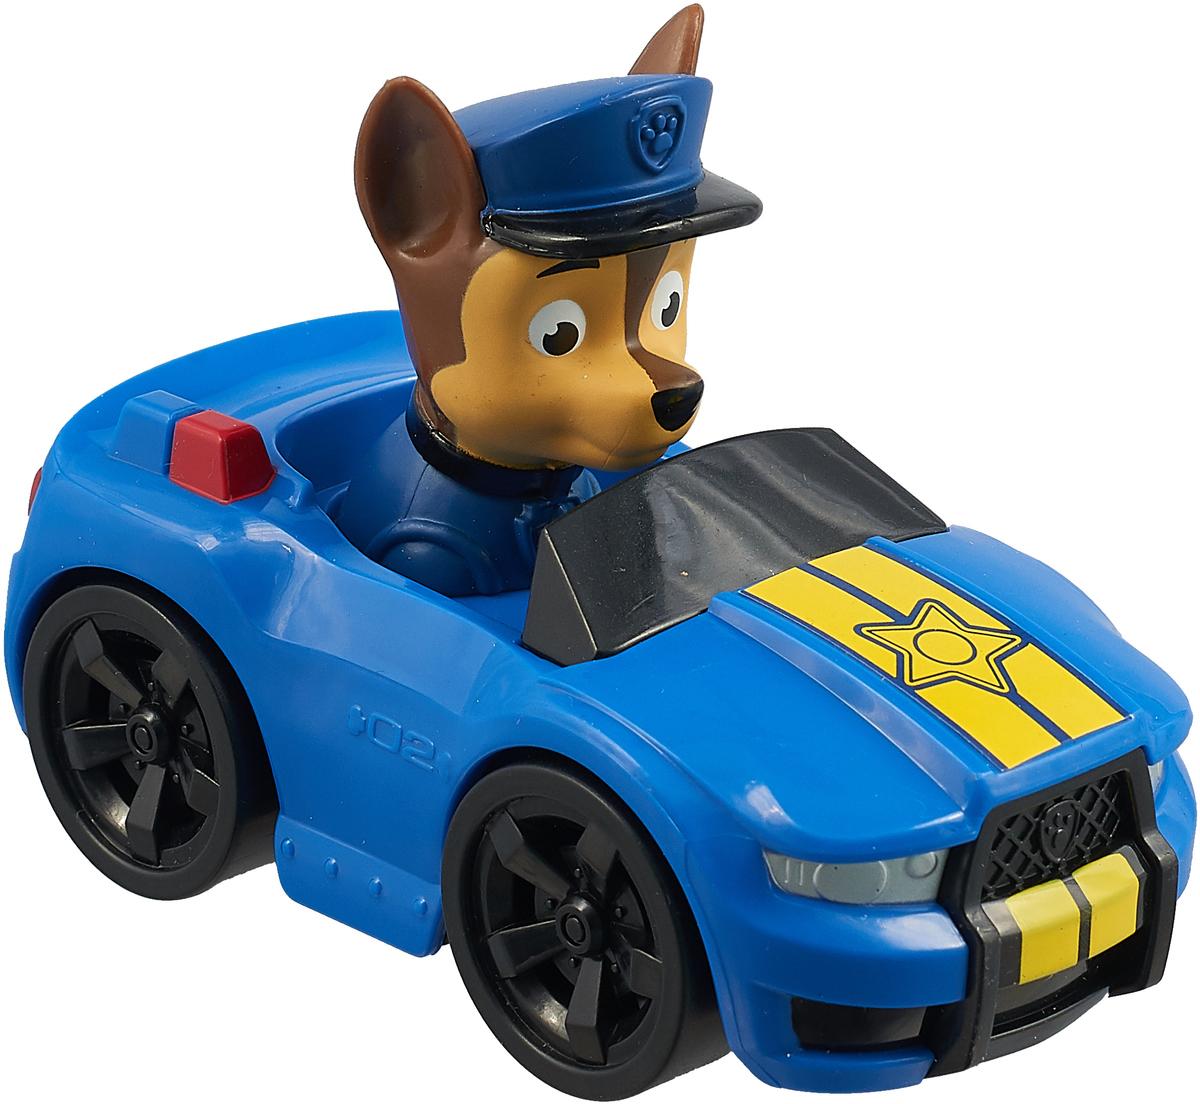 Paw Patrol Машина спасателя Chase paw patrol paw patrol мыльные пузыри paw patrol волшебная палочка 200 мл